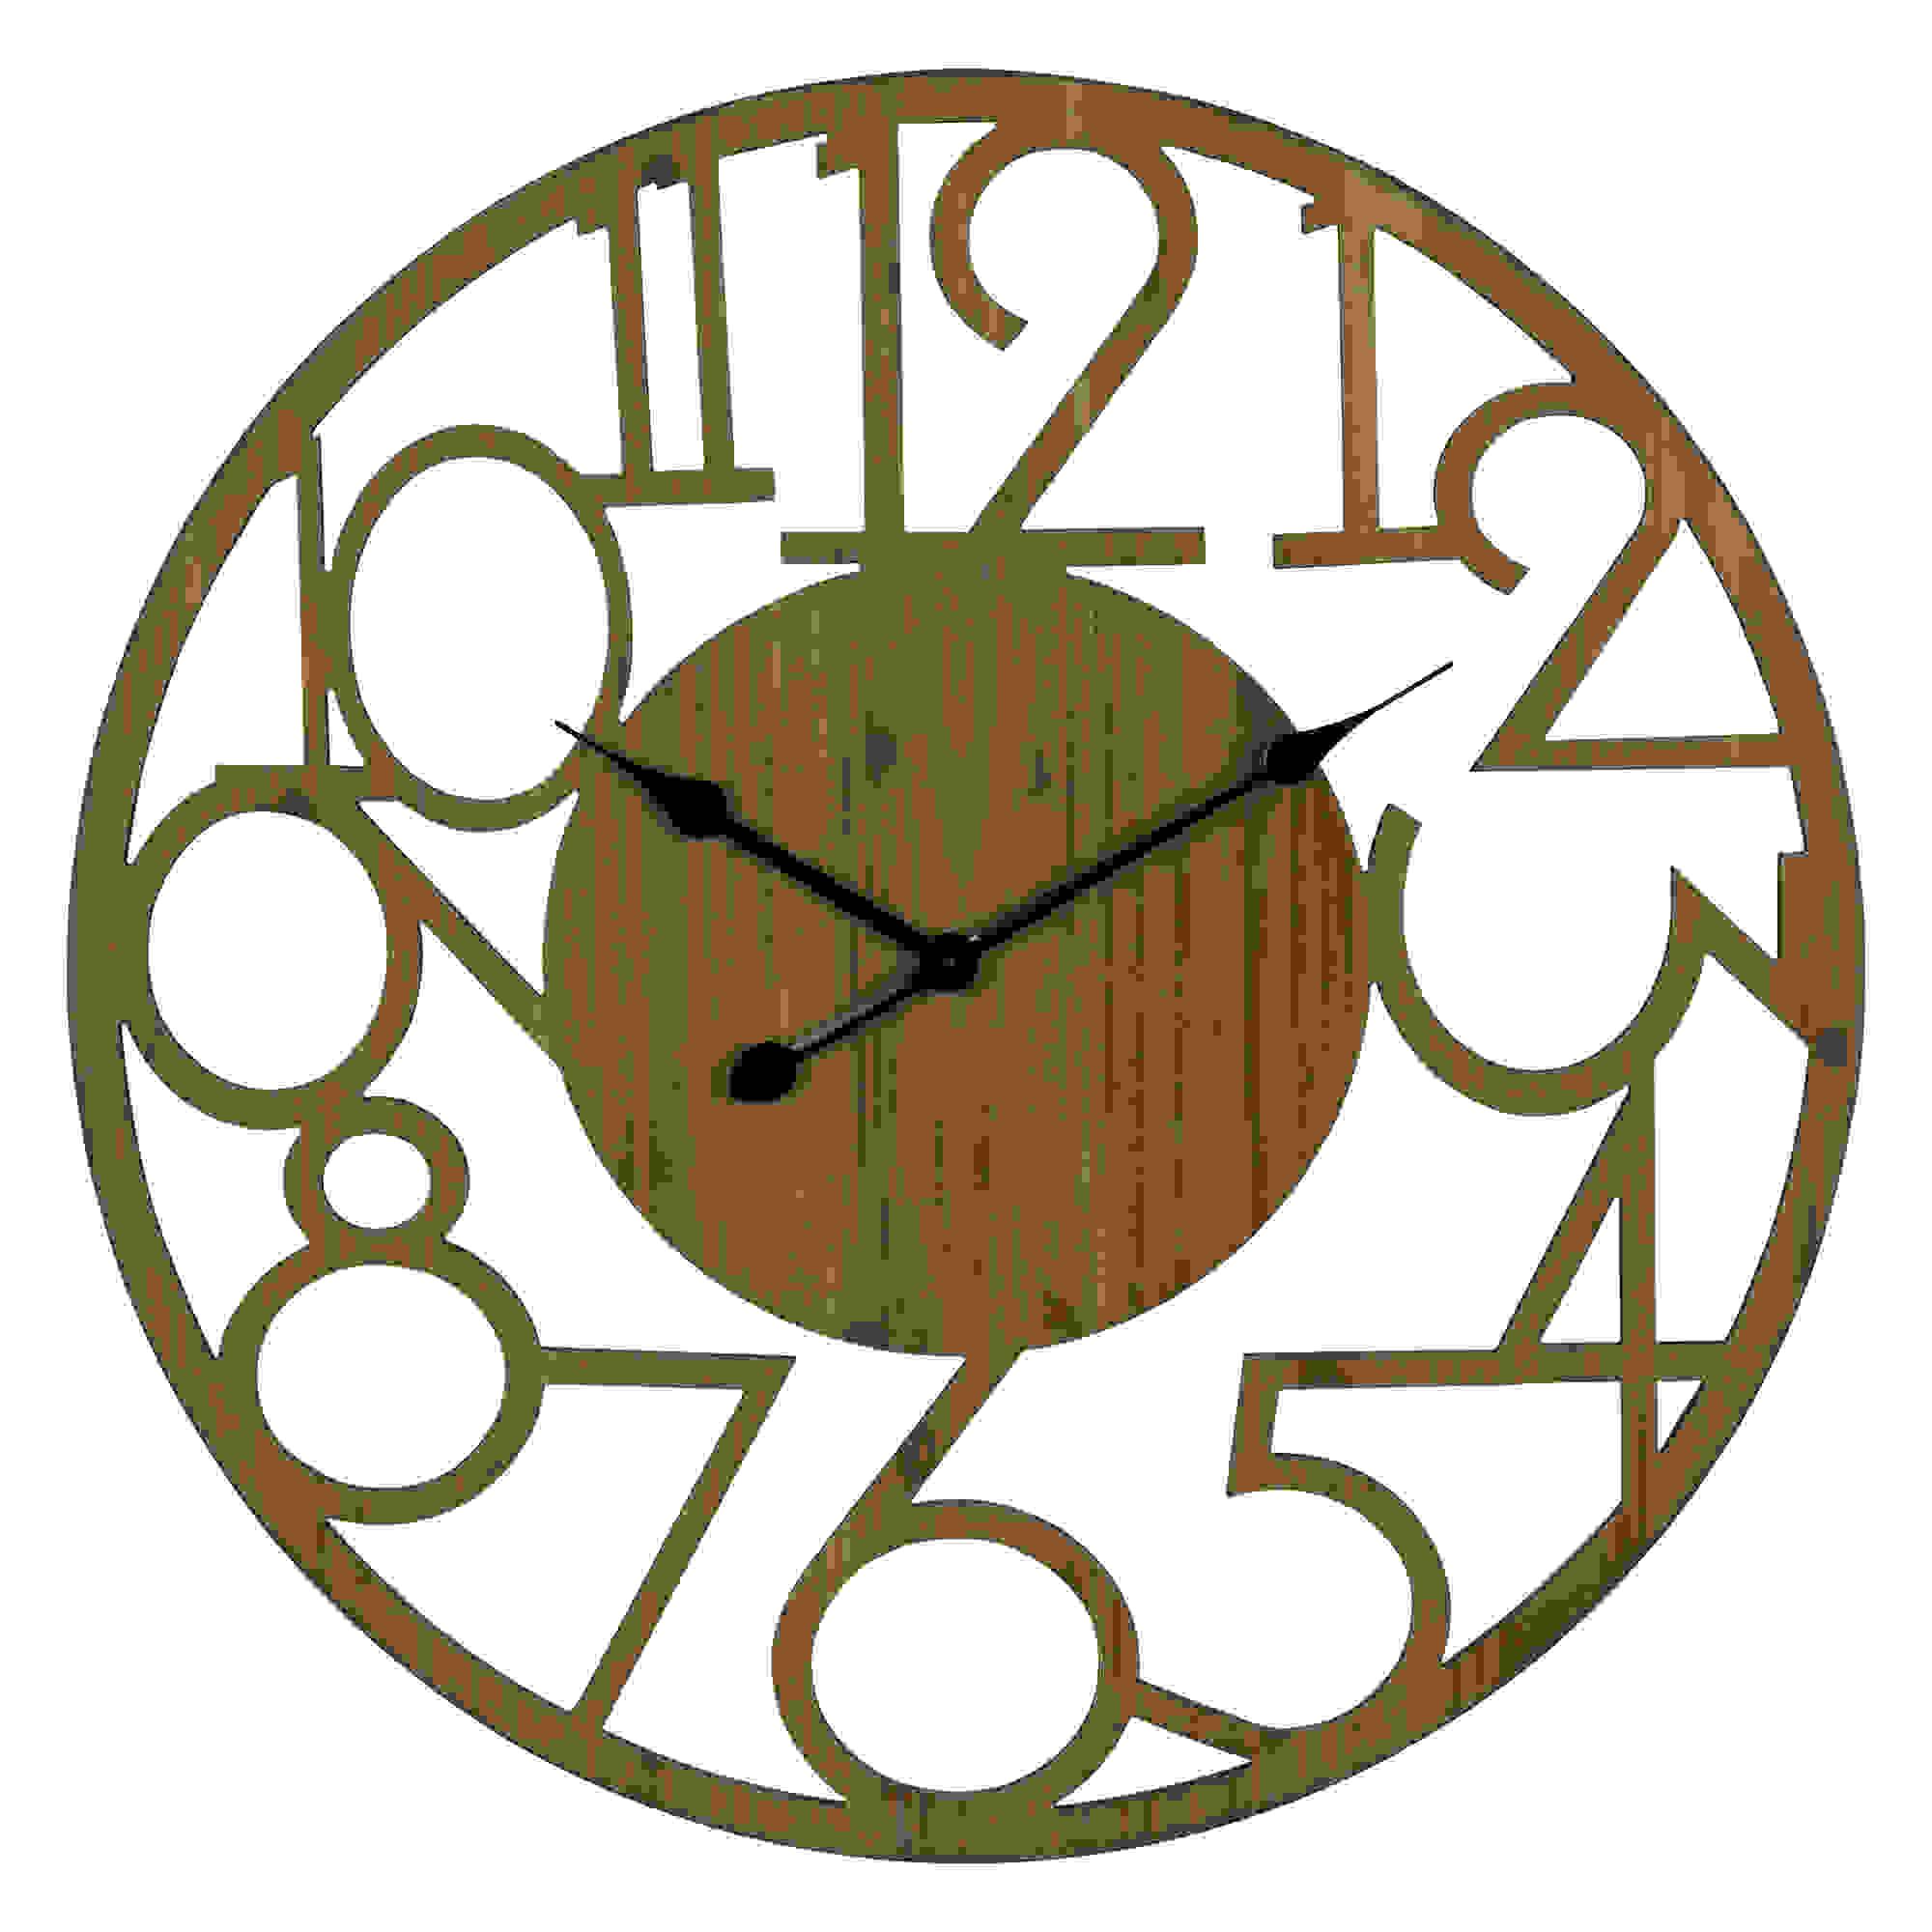 Stratton Home Decor Brady Natural Wood Wall Clock